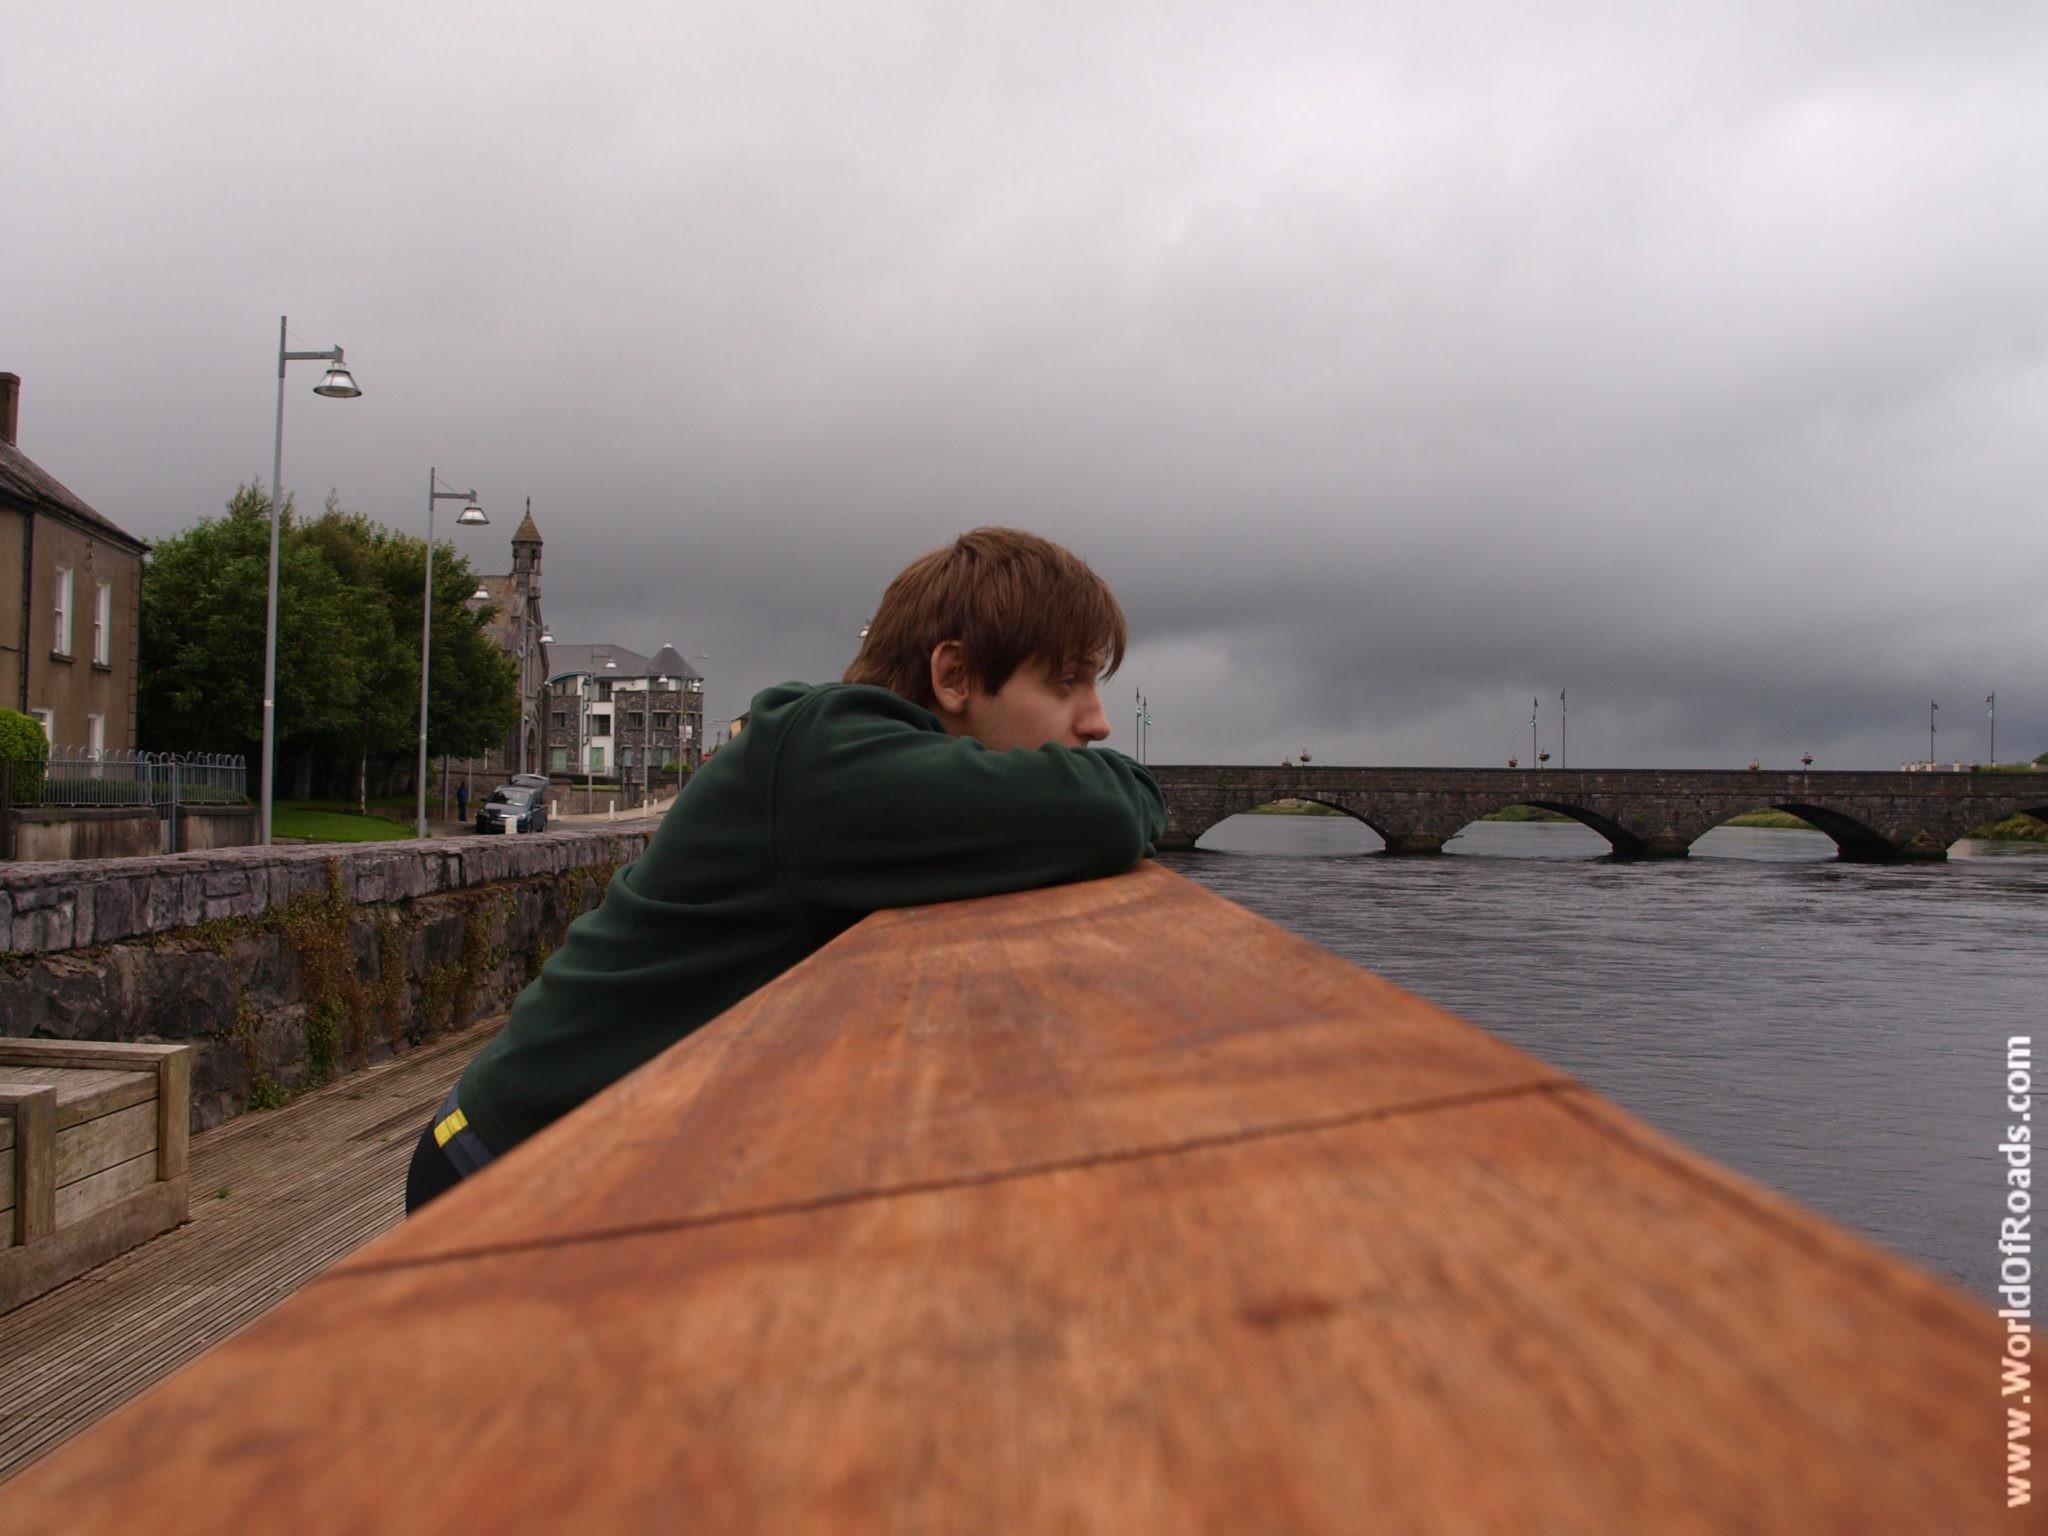 Shannon river. Limerick. Ireland.